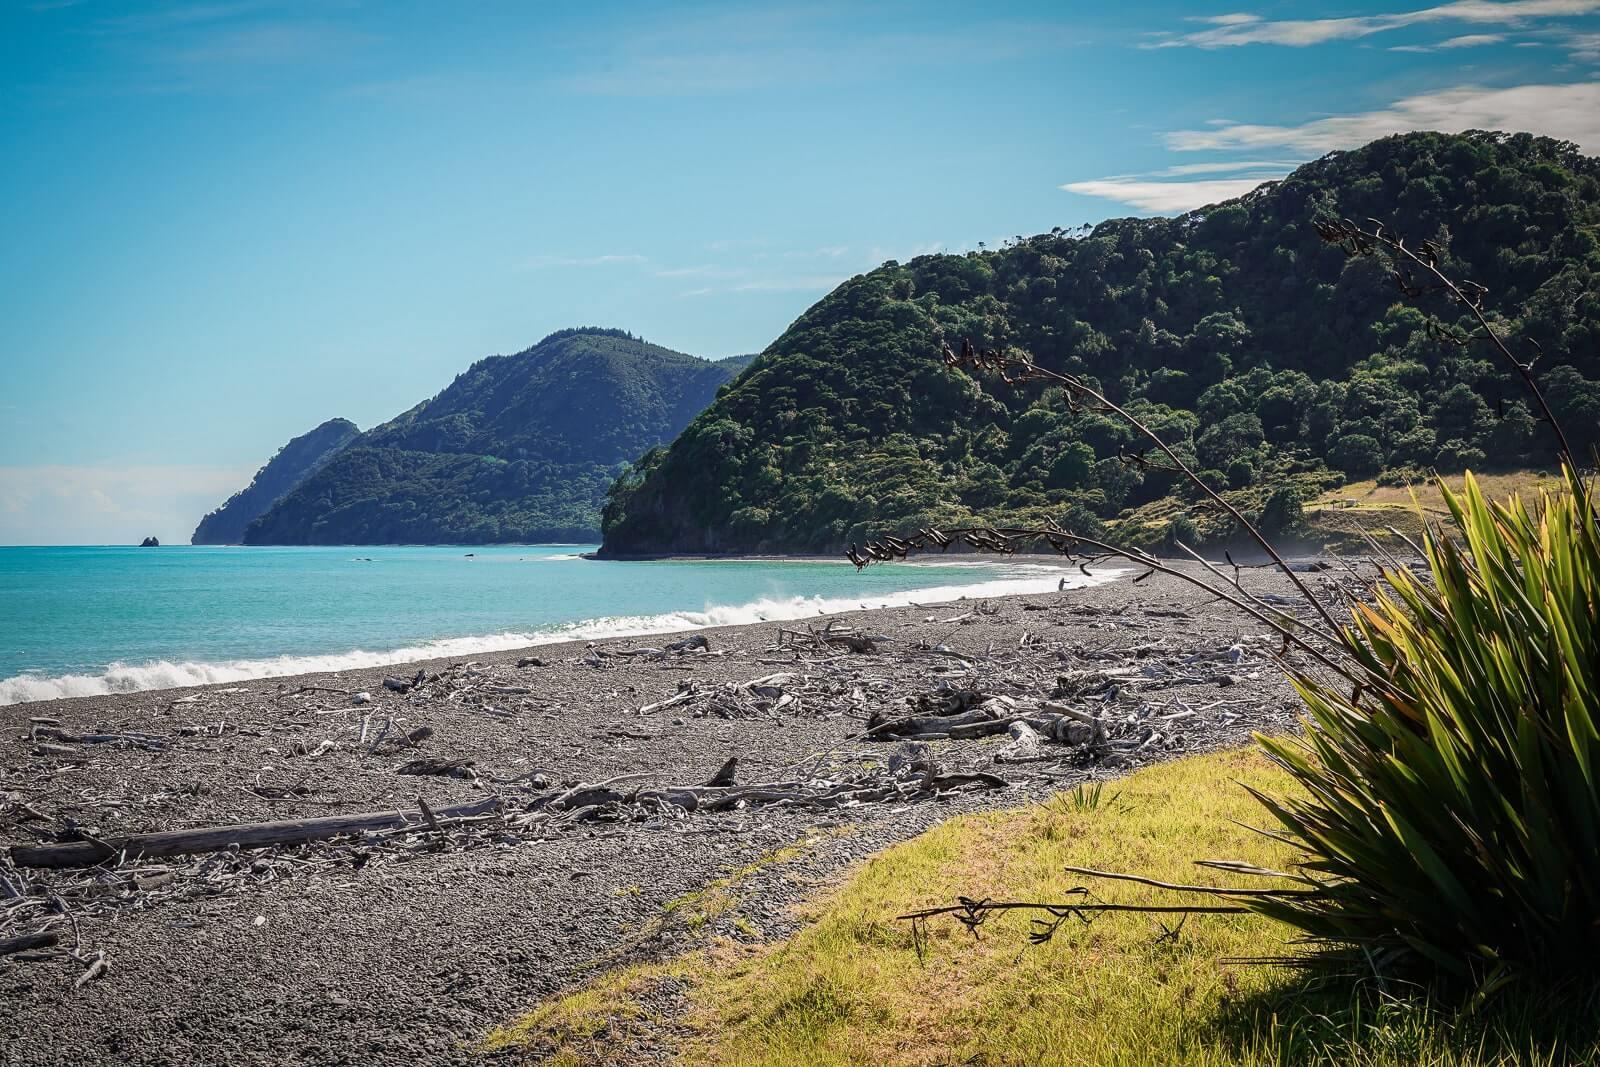 East Cape - Uitgestrekte landschappen & weinig toeristen